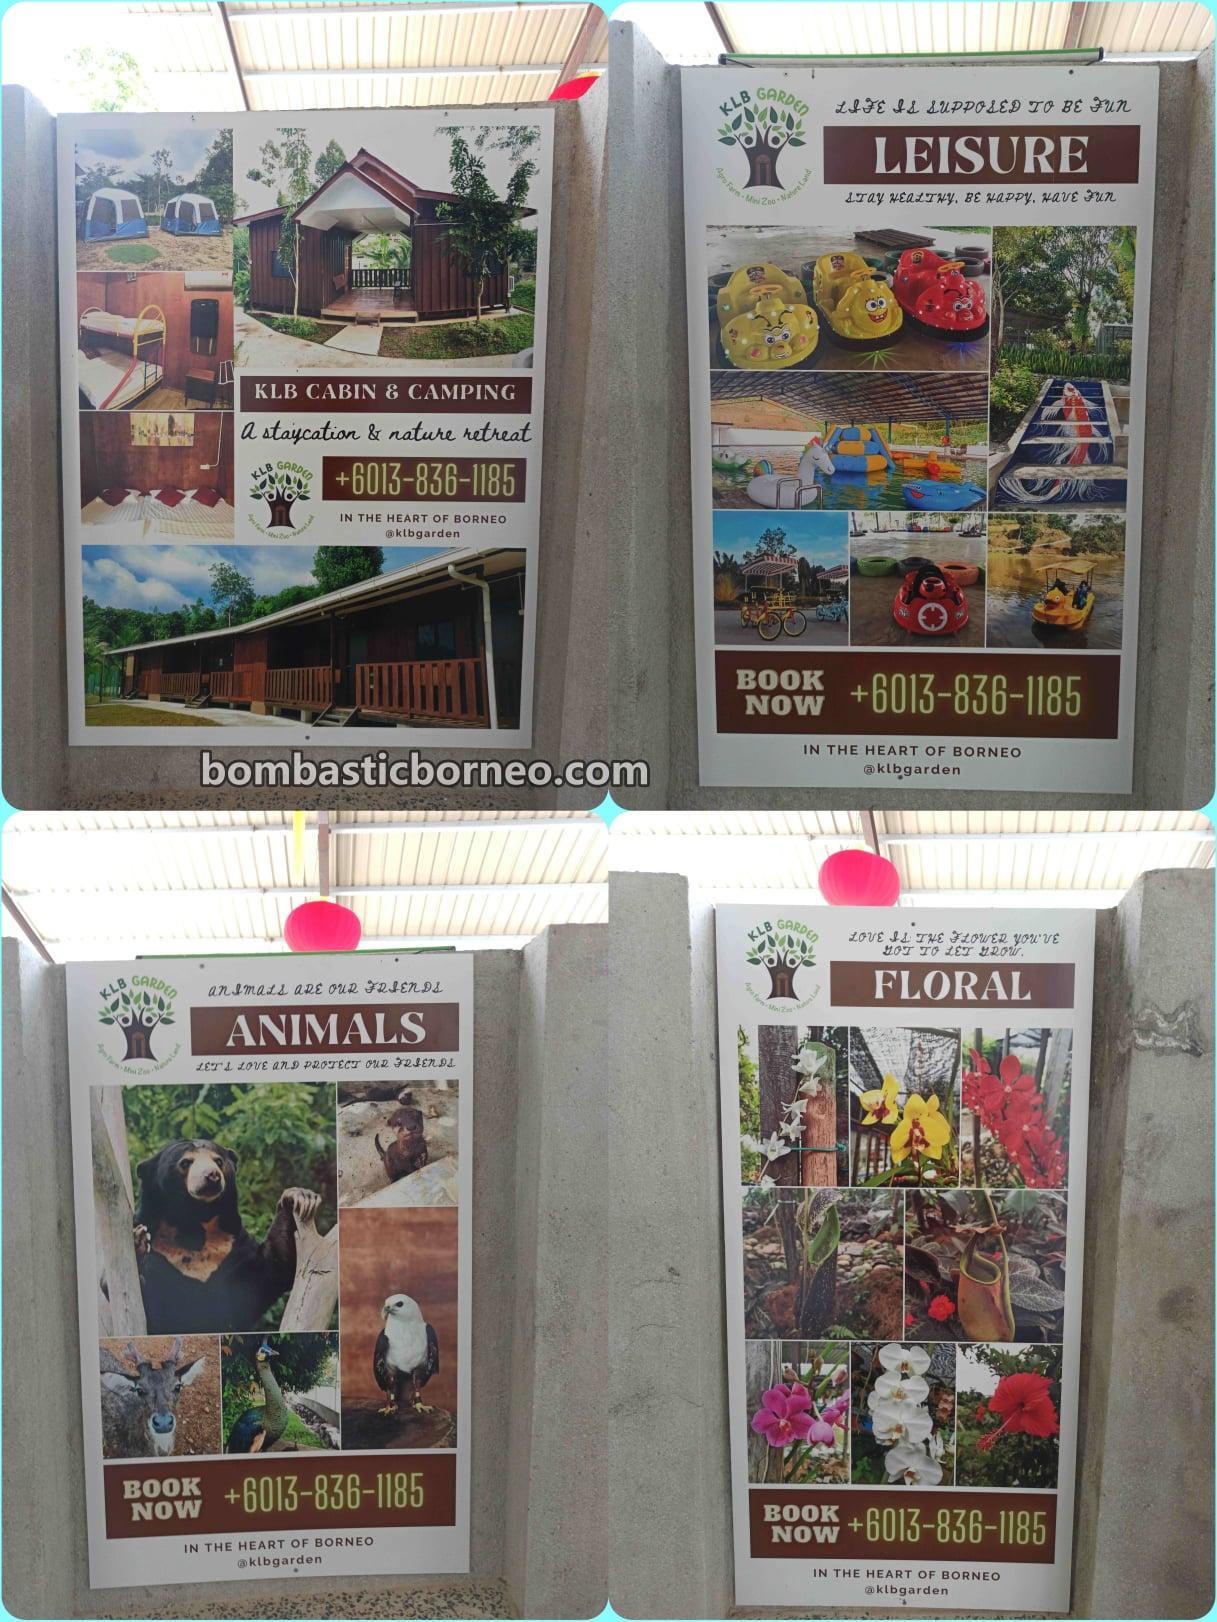 mini zoo, animal, leisure, flora, vacation, nature, outdoor, Tebedu, Malaysia, objek wisata, travel guide, Trans Borneo, 马来西亚砂拉越, 打必律郭乃武苑, 西连旅游胜地,